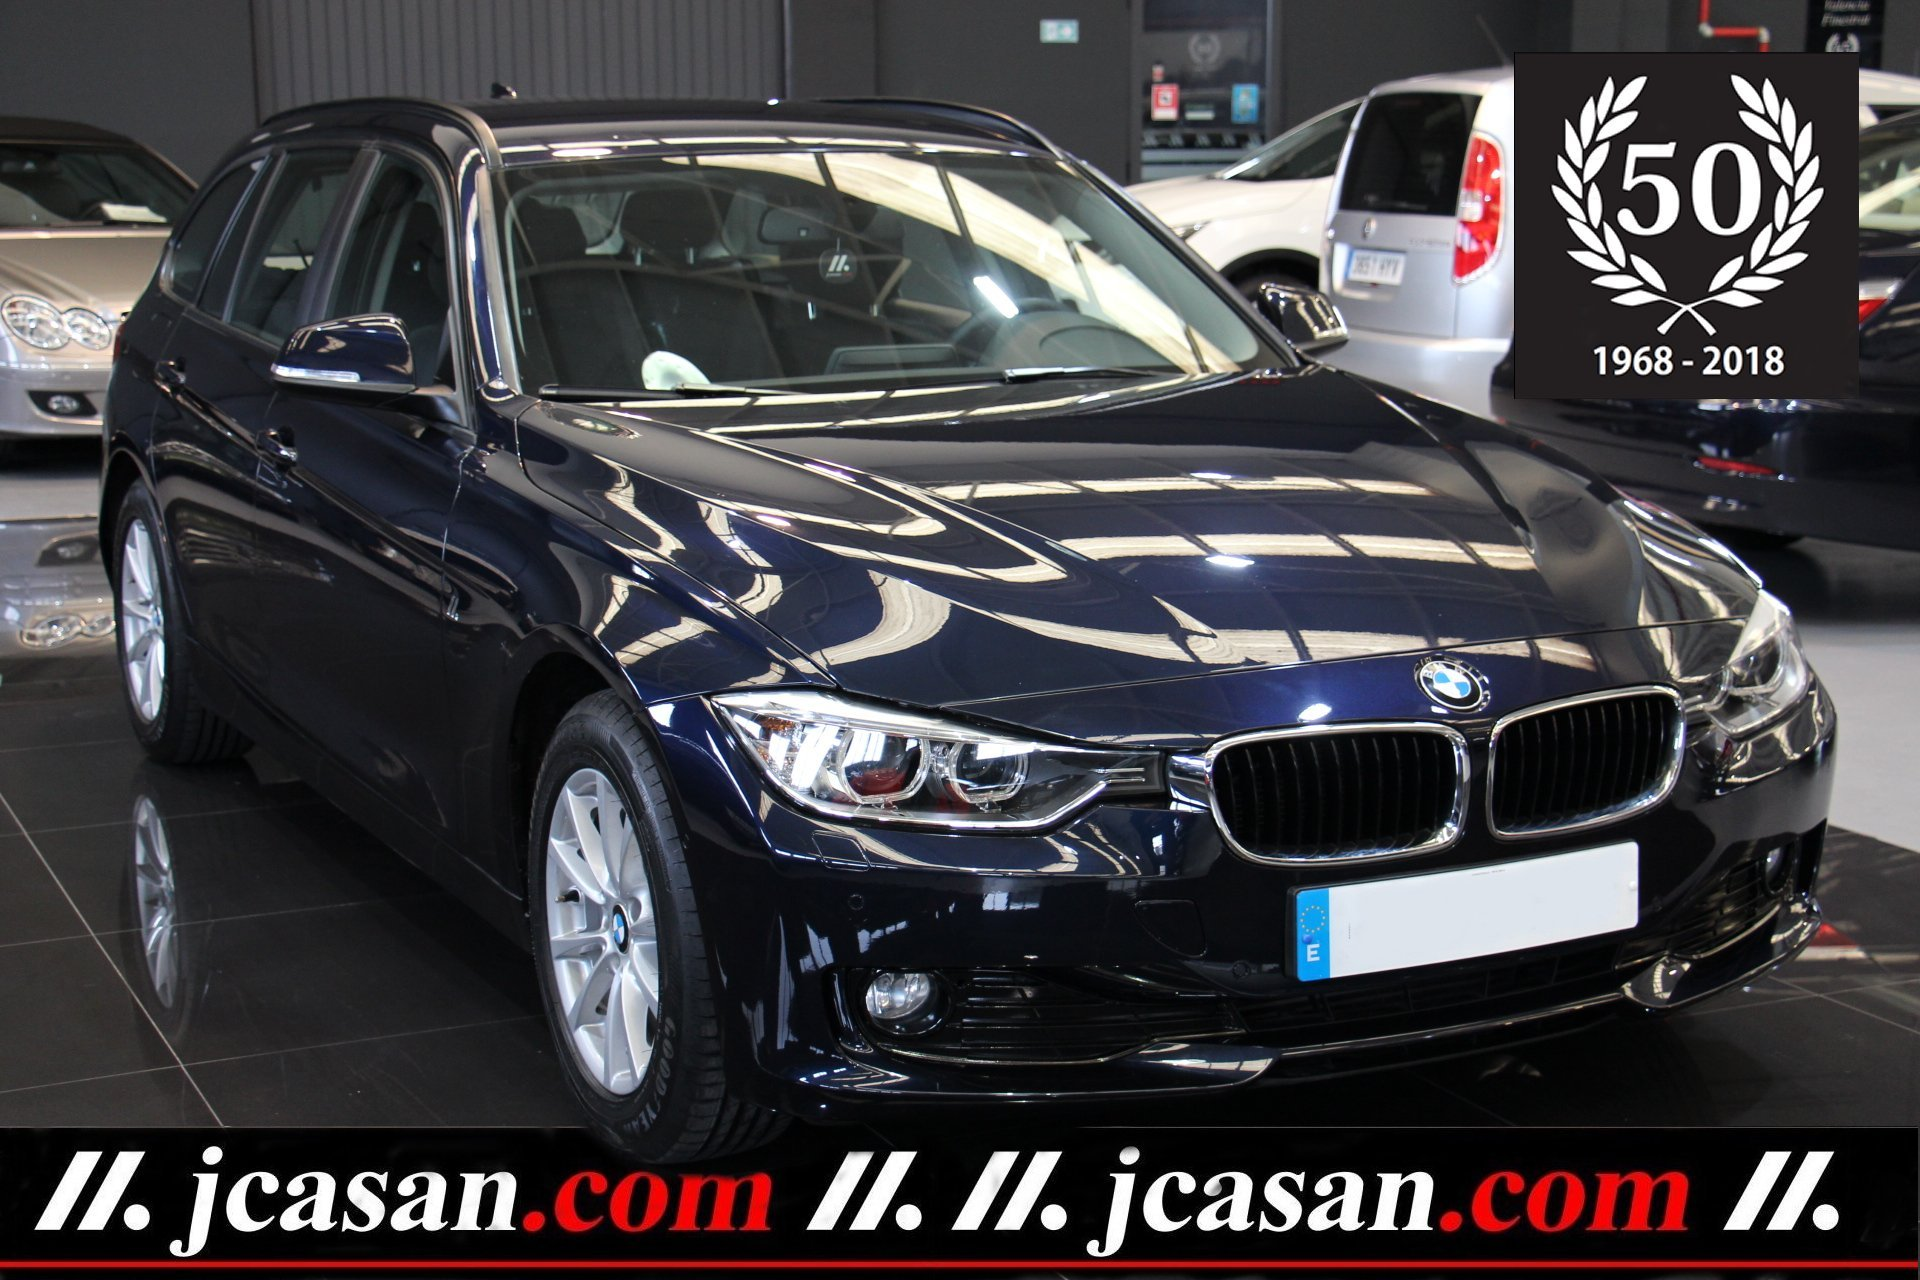 BMW 318d 143 CV TOURING 6 Vel